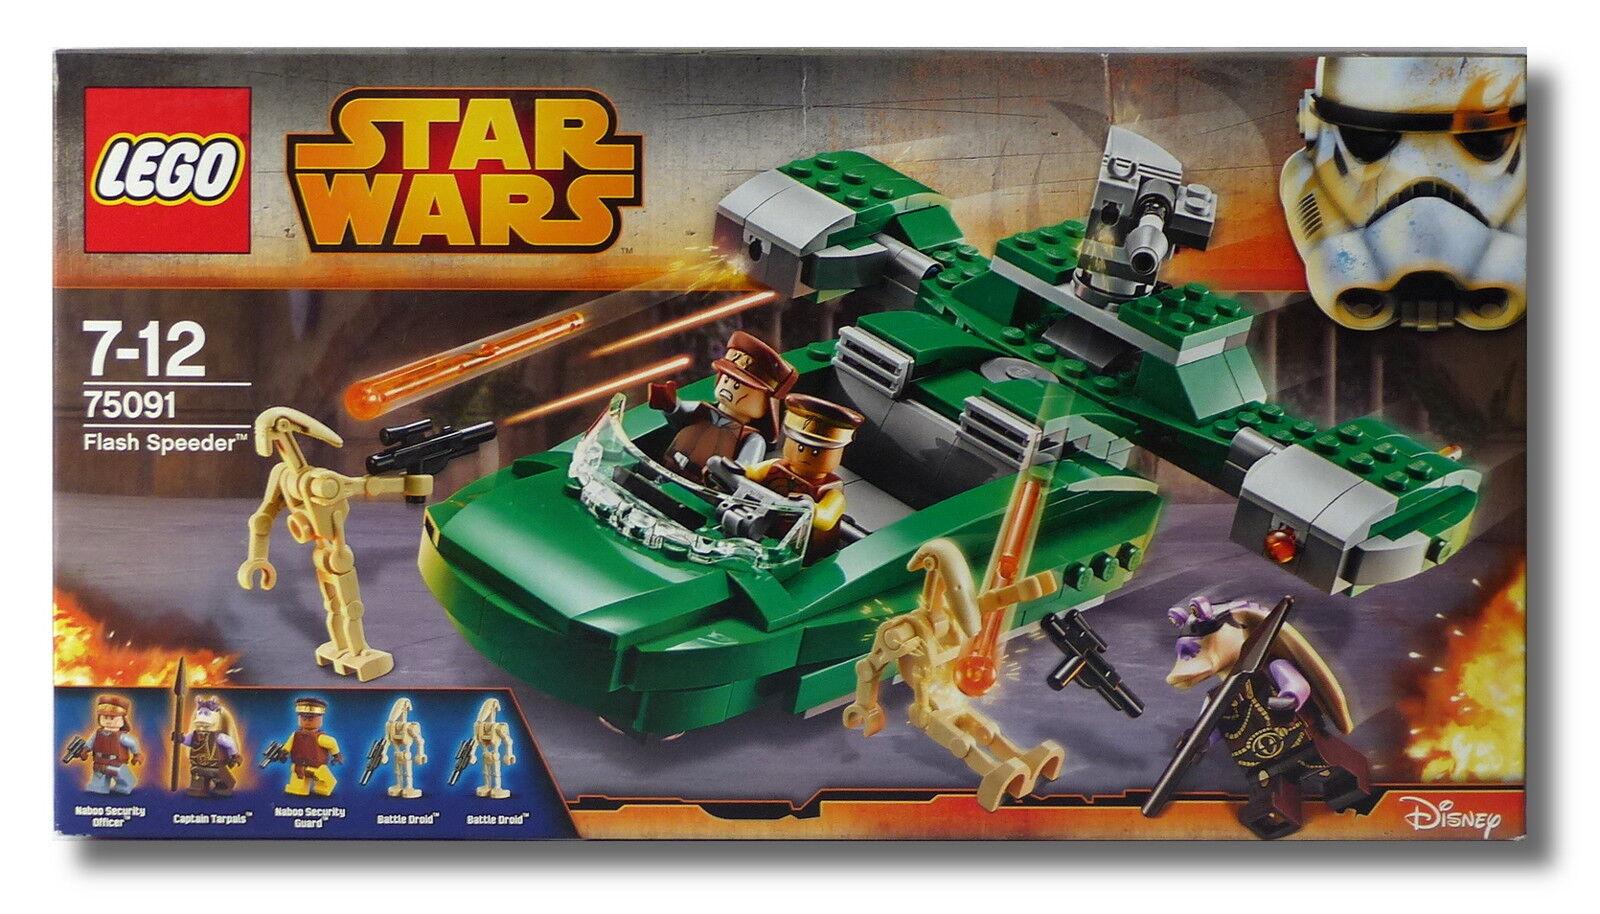 LEGO ® Star Wars ™ 75091 Flash Speeder ™ Naboo truppa guardia Collector 2015 Nuovo/Scatola Originale